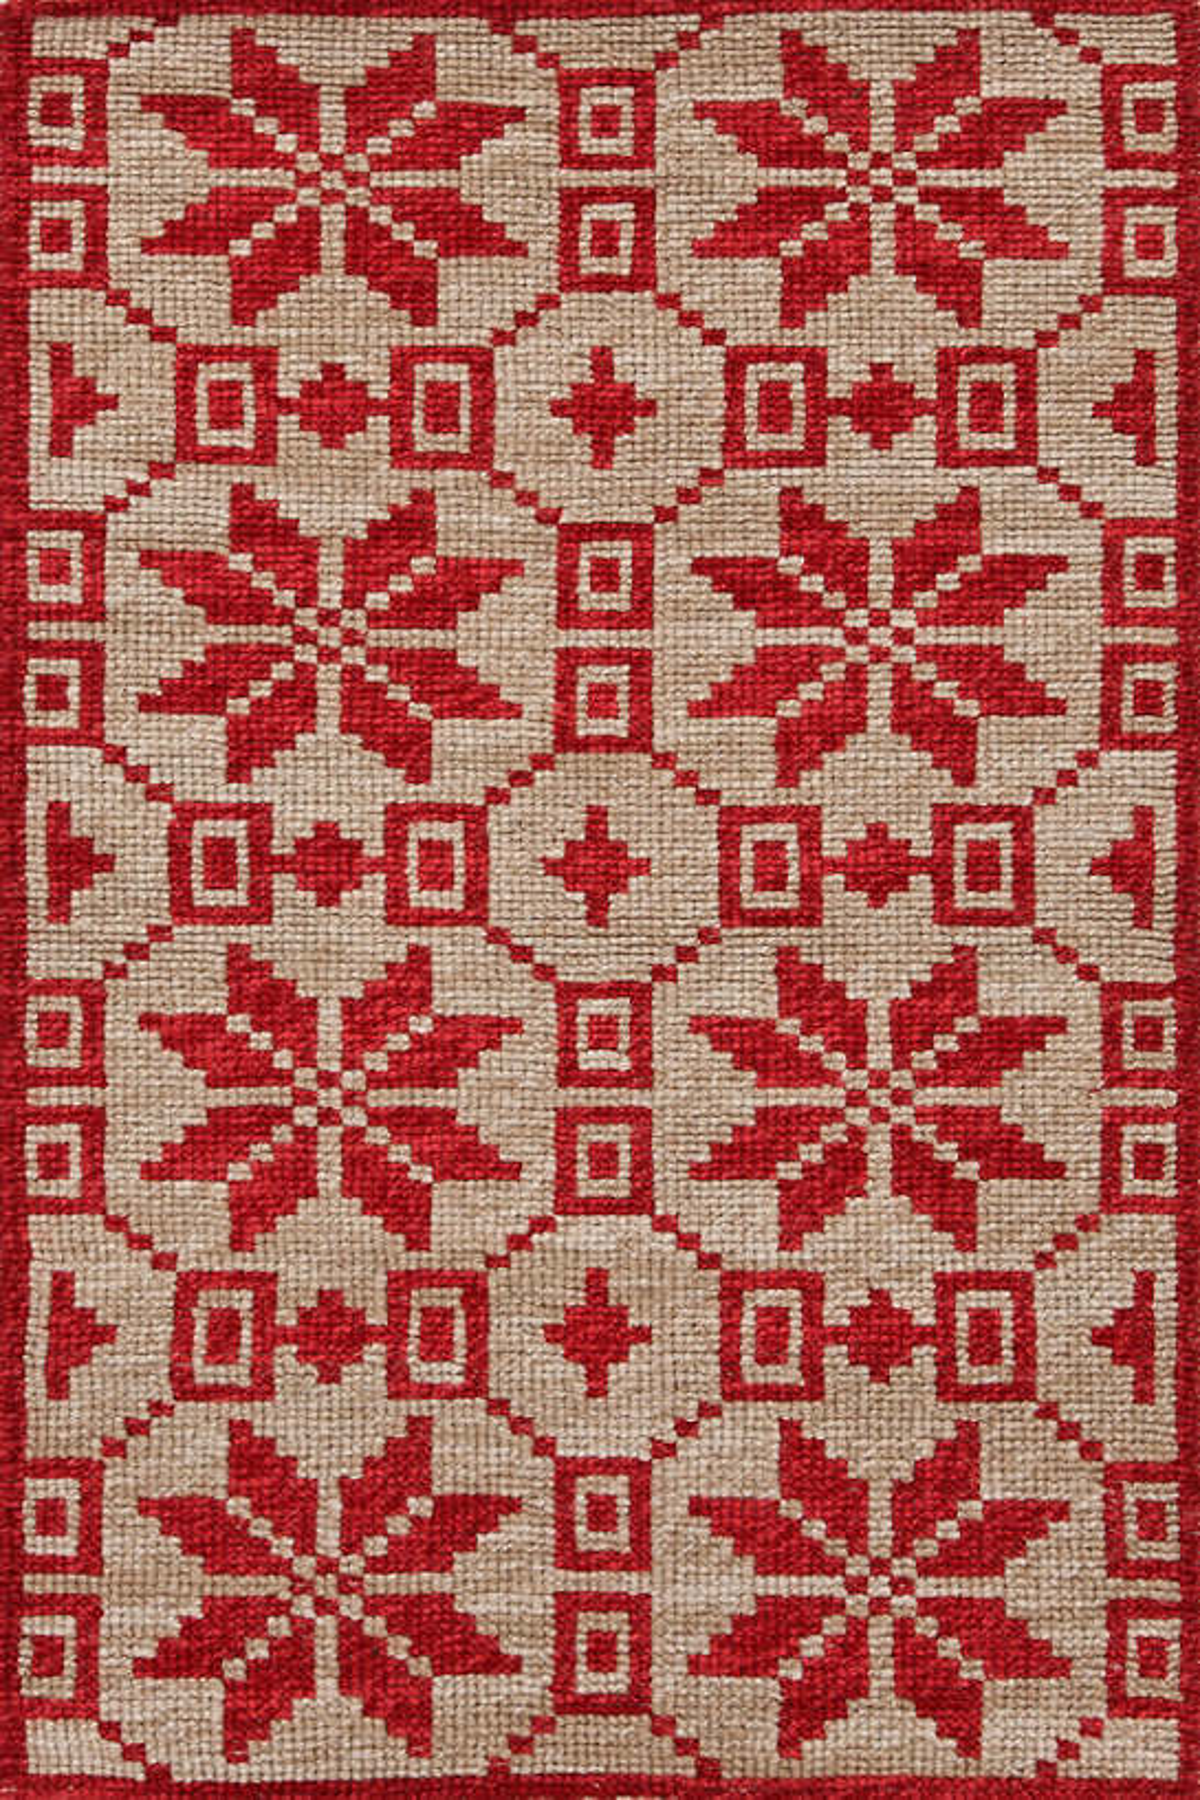 Nordic Star Crimson Wool Woven Rug